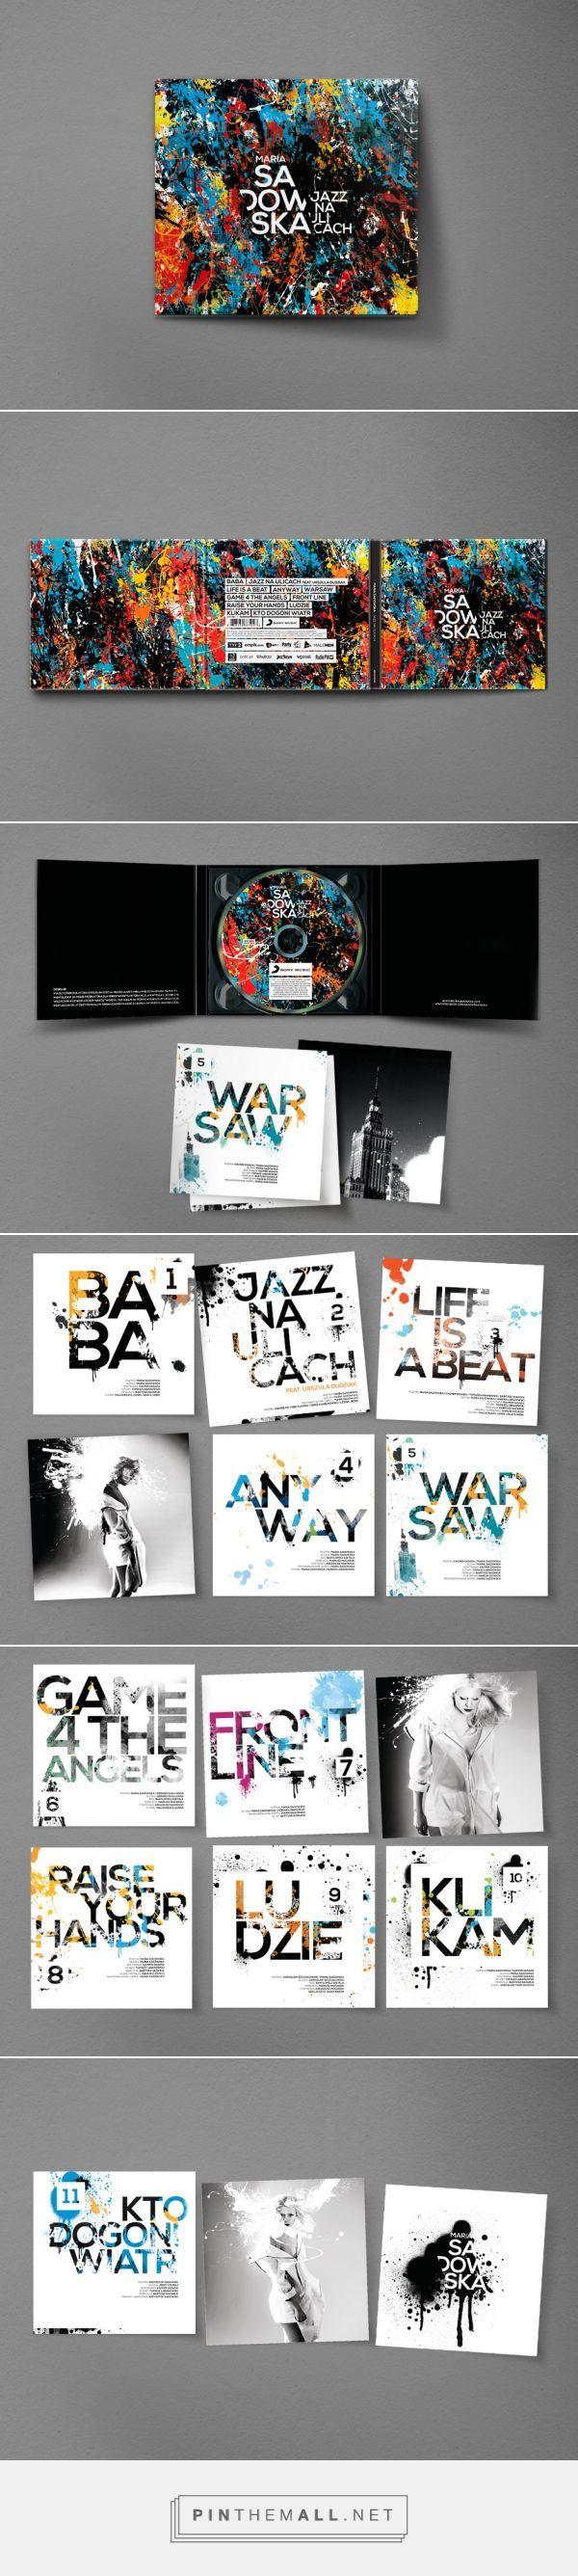 Maria Sadowska - Jazz na ulicach CD album - Packaging of the World - Creative Package Design Gallery - http://www.packagingoftheworld.com/2016/07/maria-sadowska-jazz-na-ulicach.html